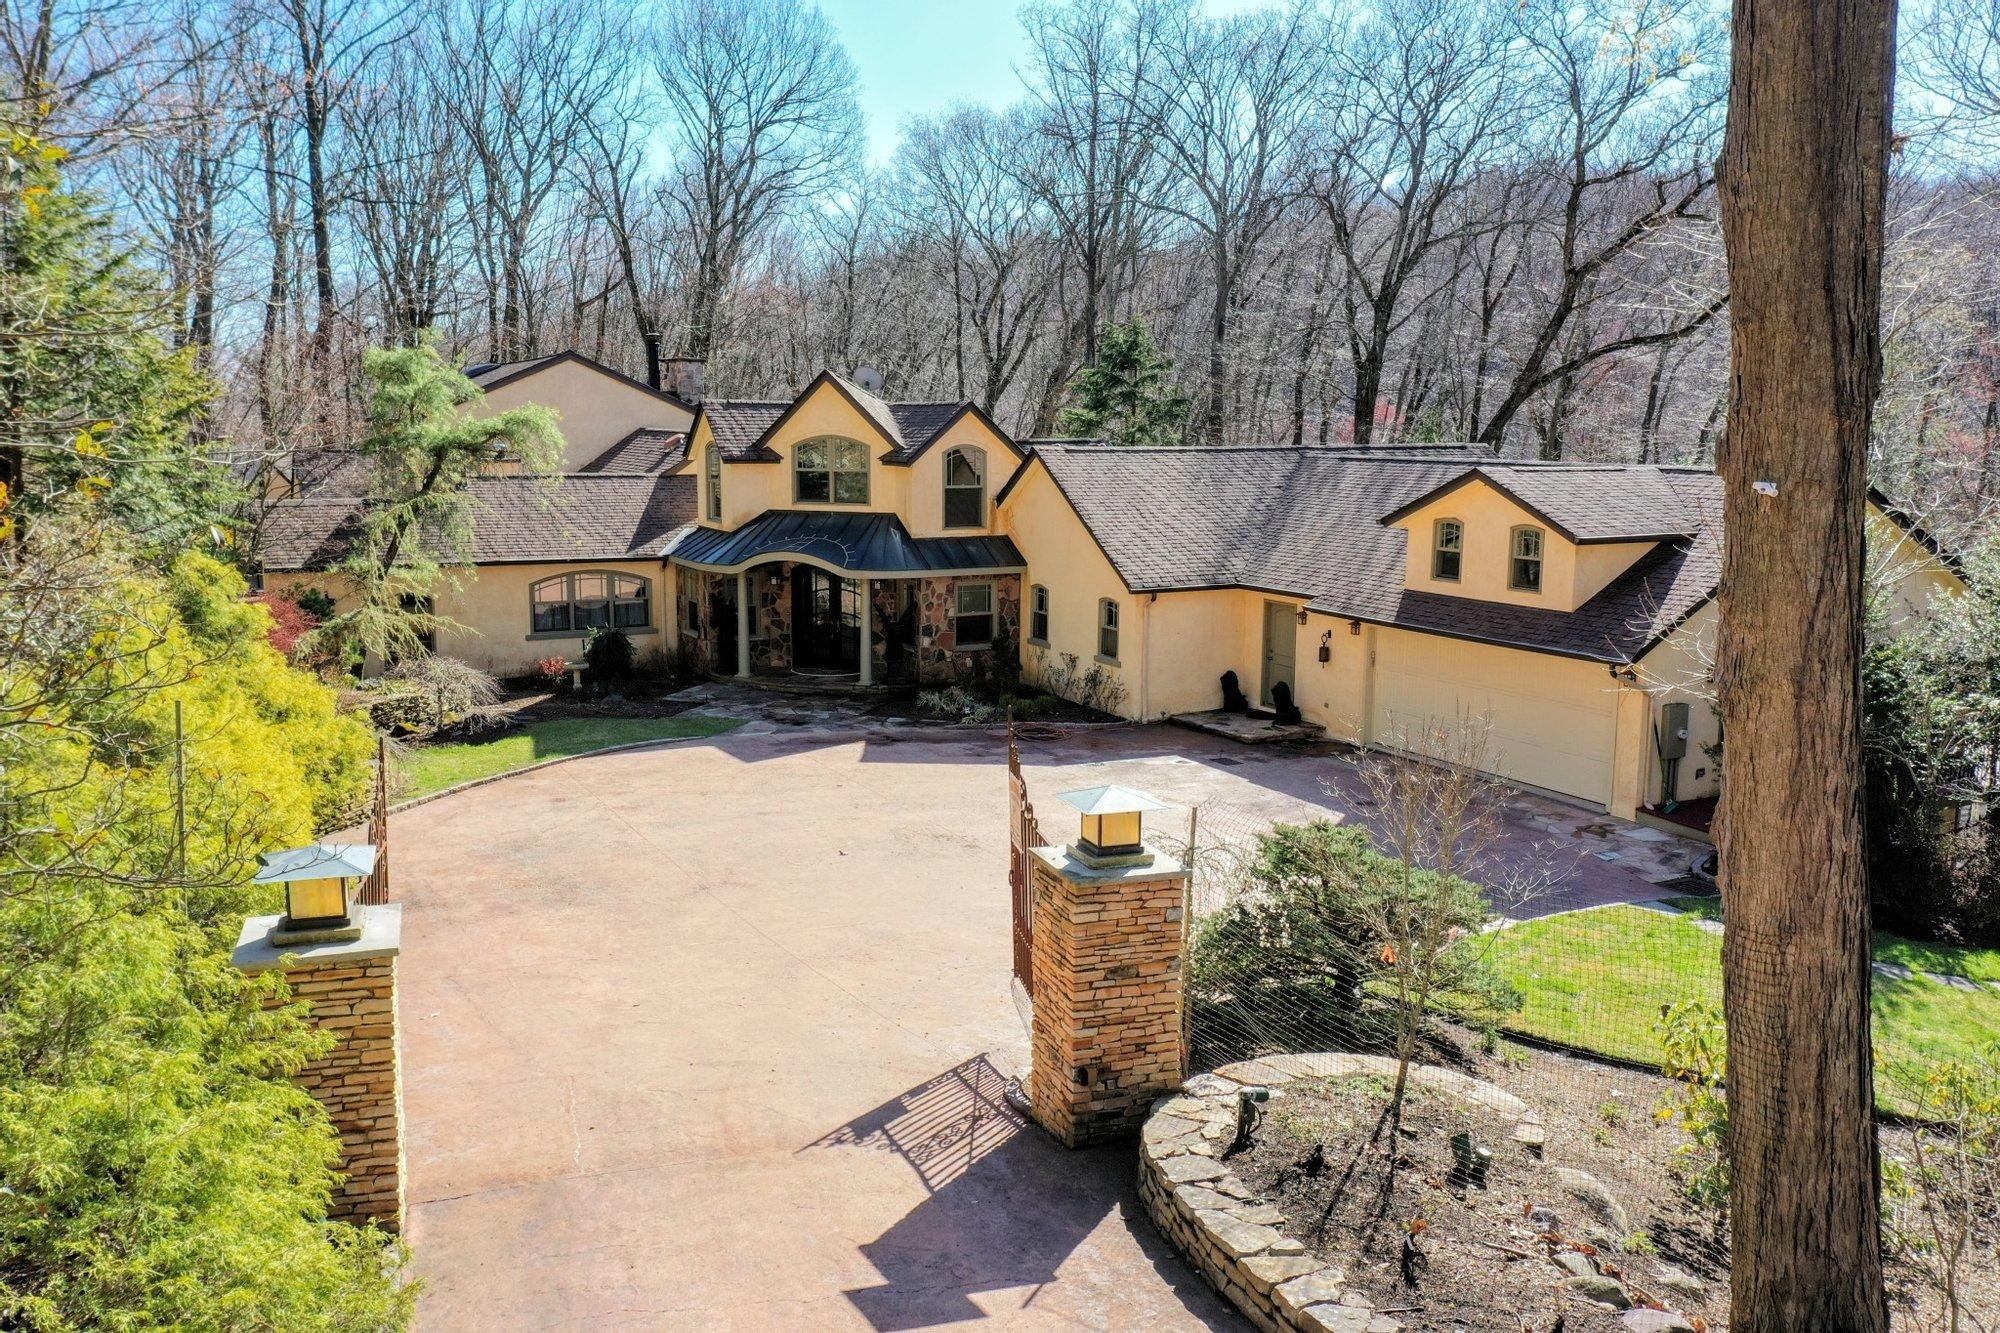 Casa a Kinnelon, New Jersey, Stati Uniti 1 - 11417808